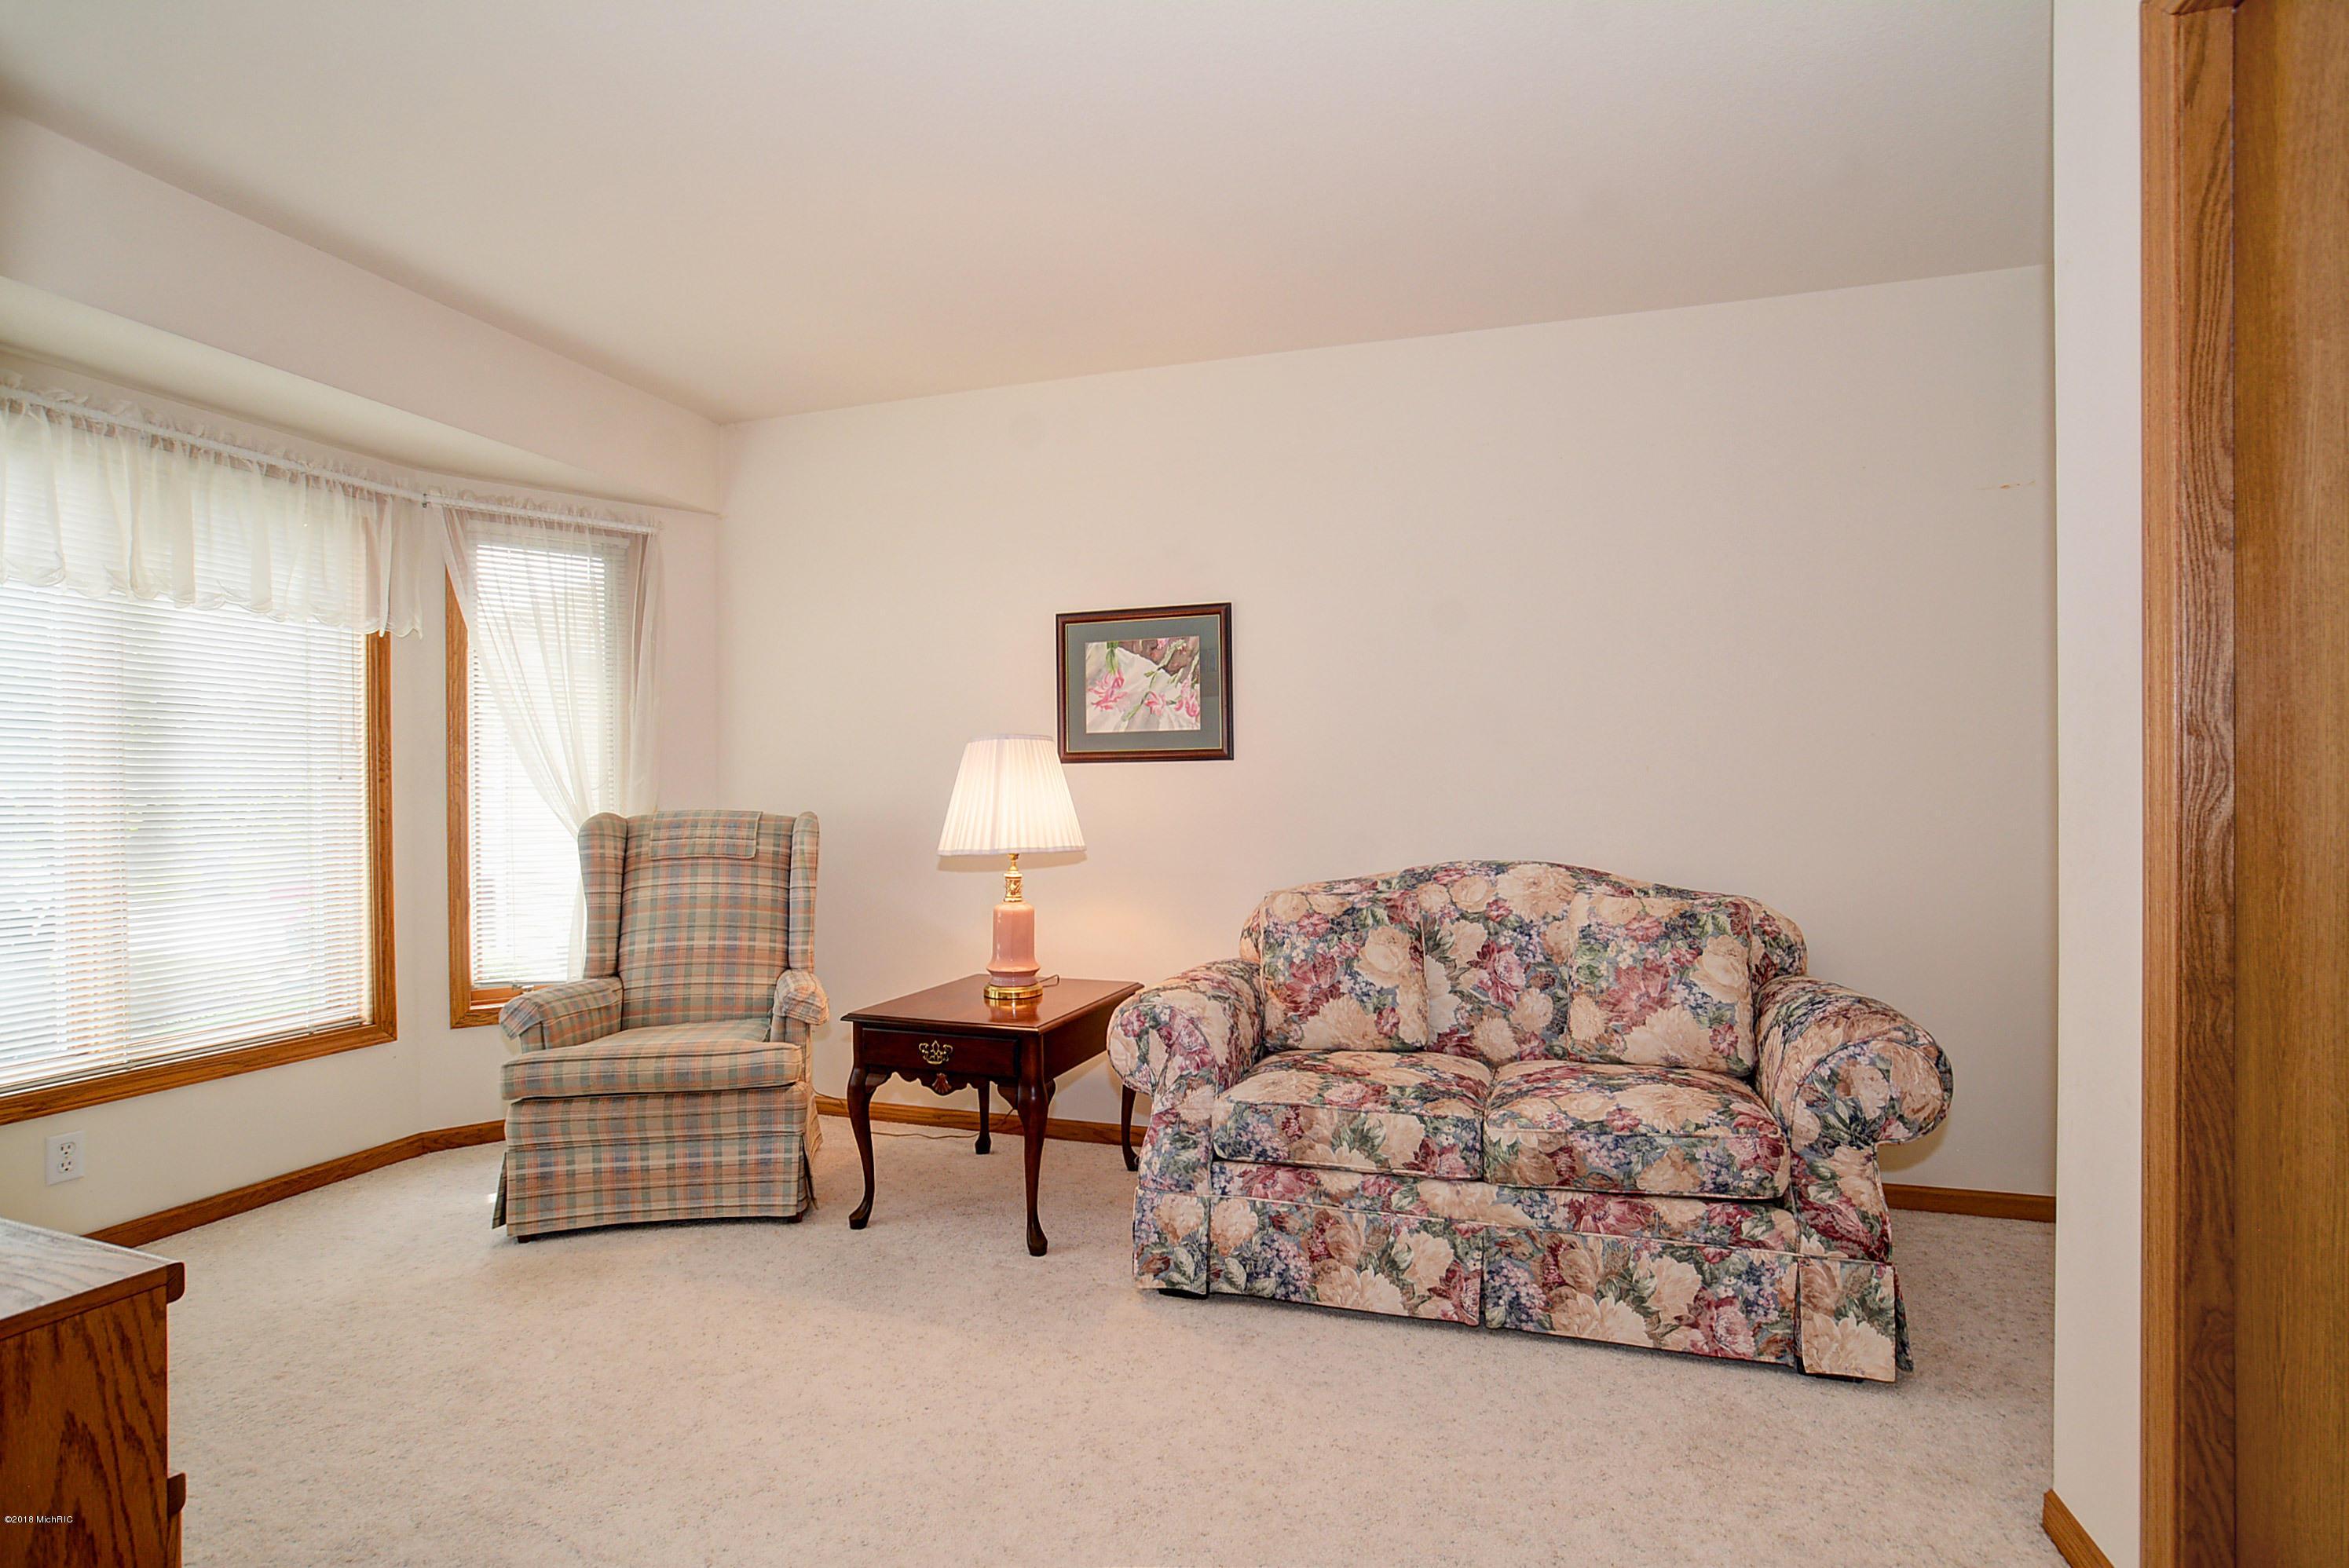 4286 Redbush Drive Sw 61 Grandville 49418 Sold Listing Mls